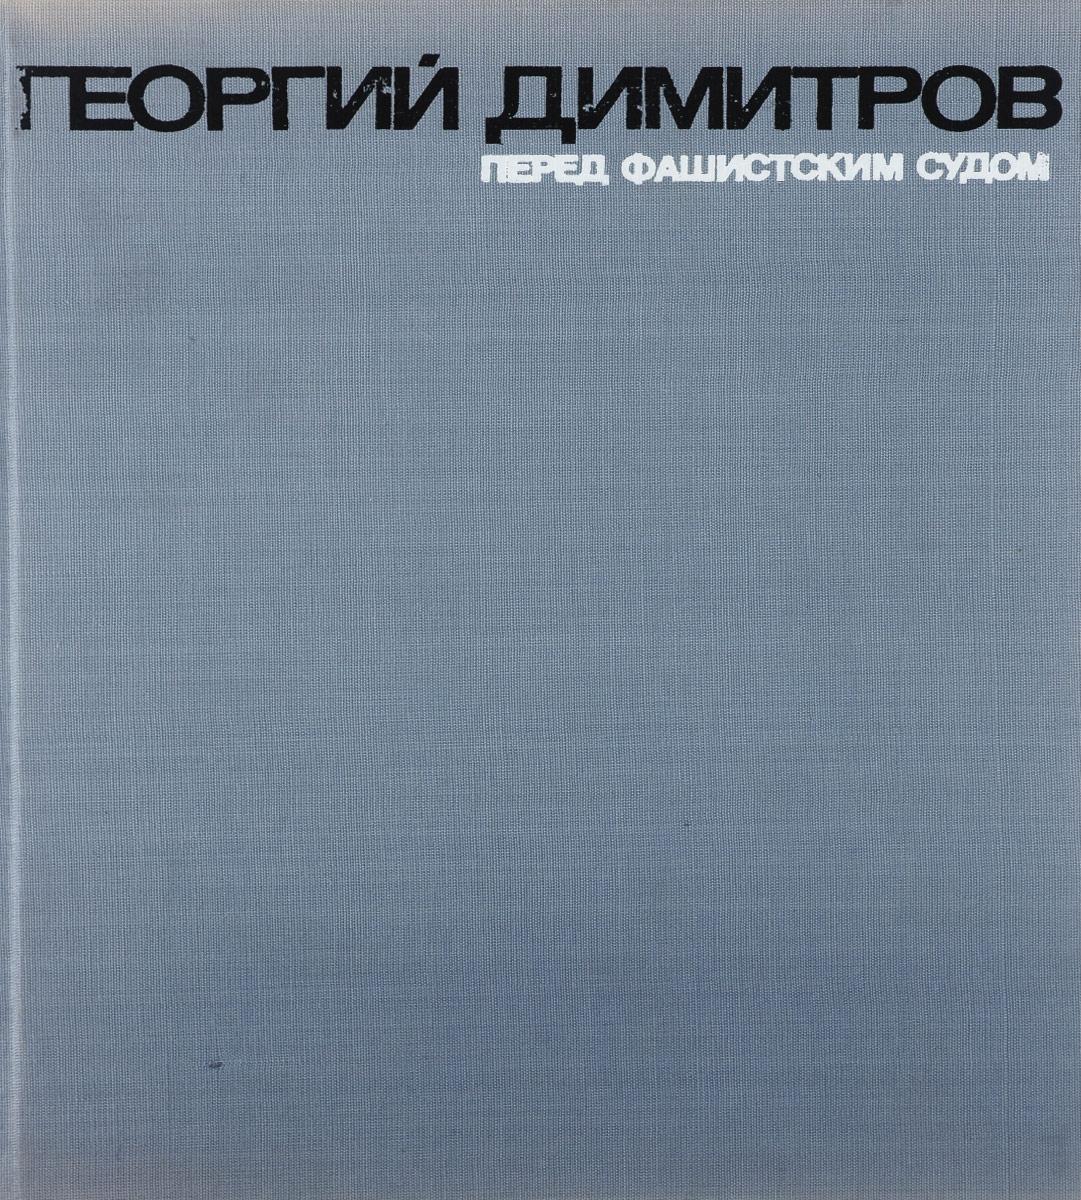 Zakazat.ru: Георгий Димитров перед фашистским судом. Мария Сукманджиева